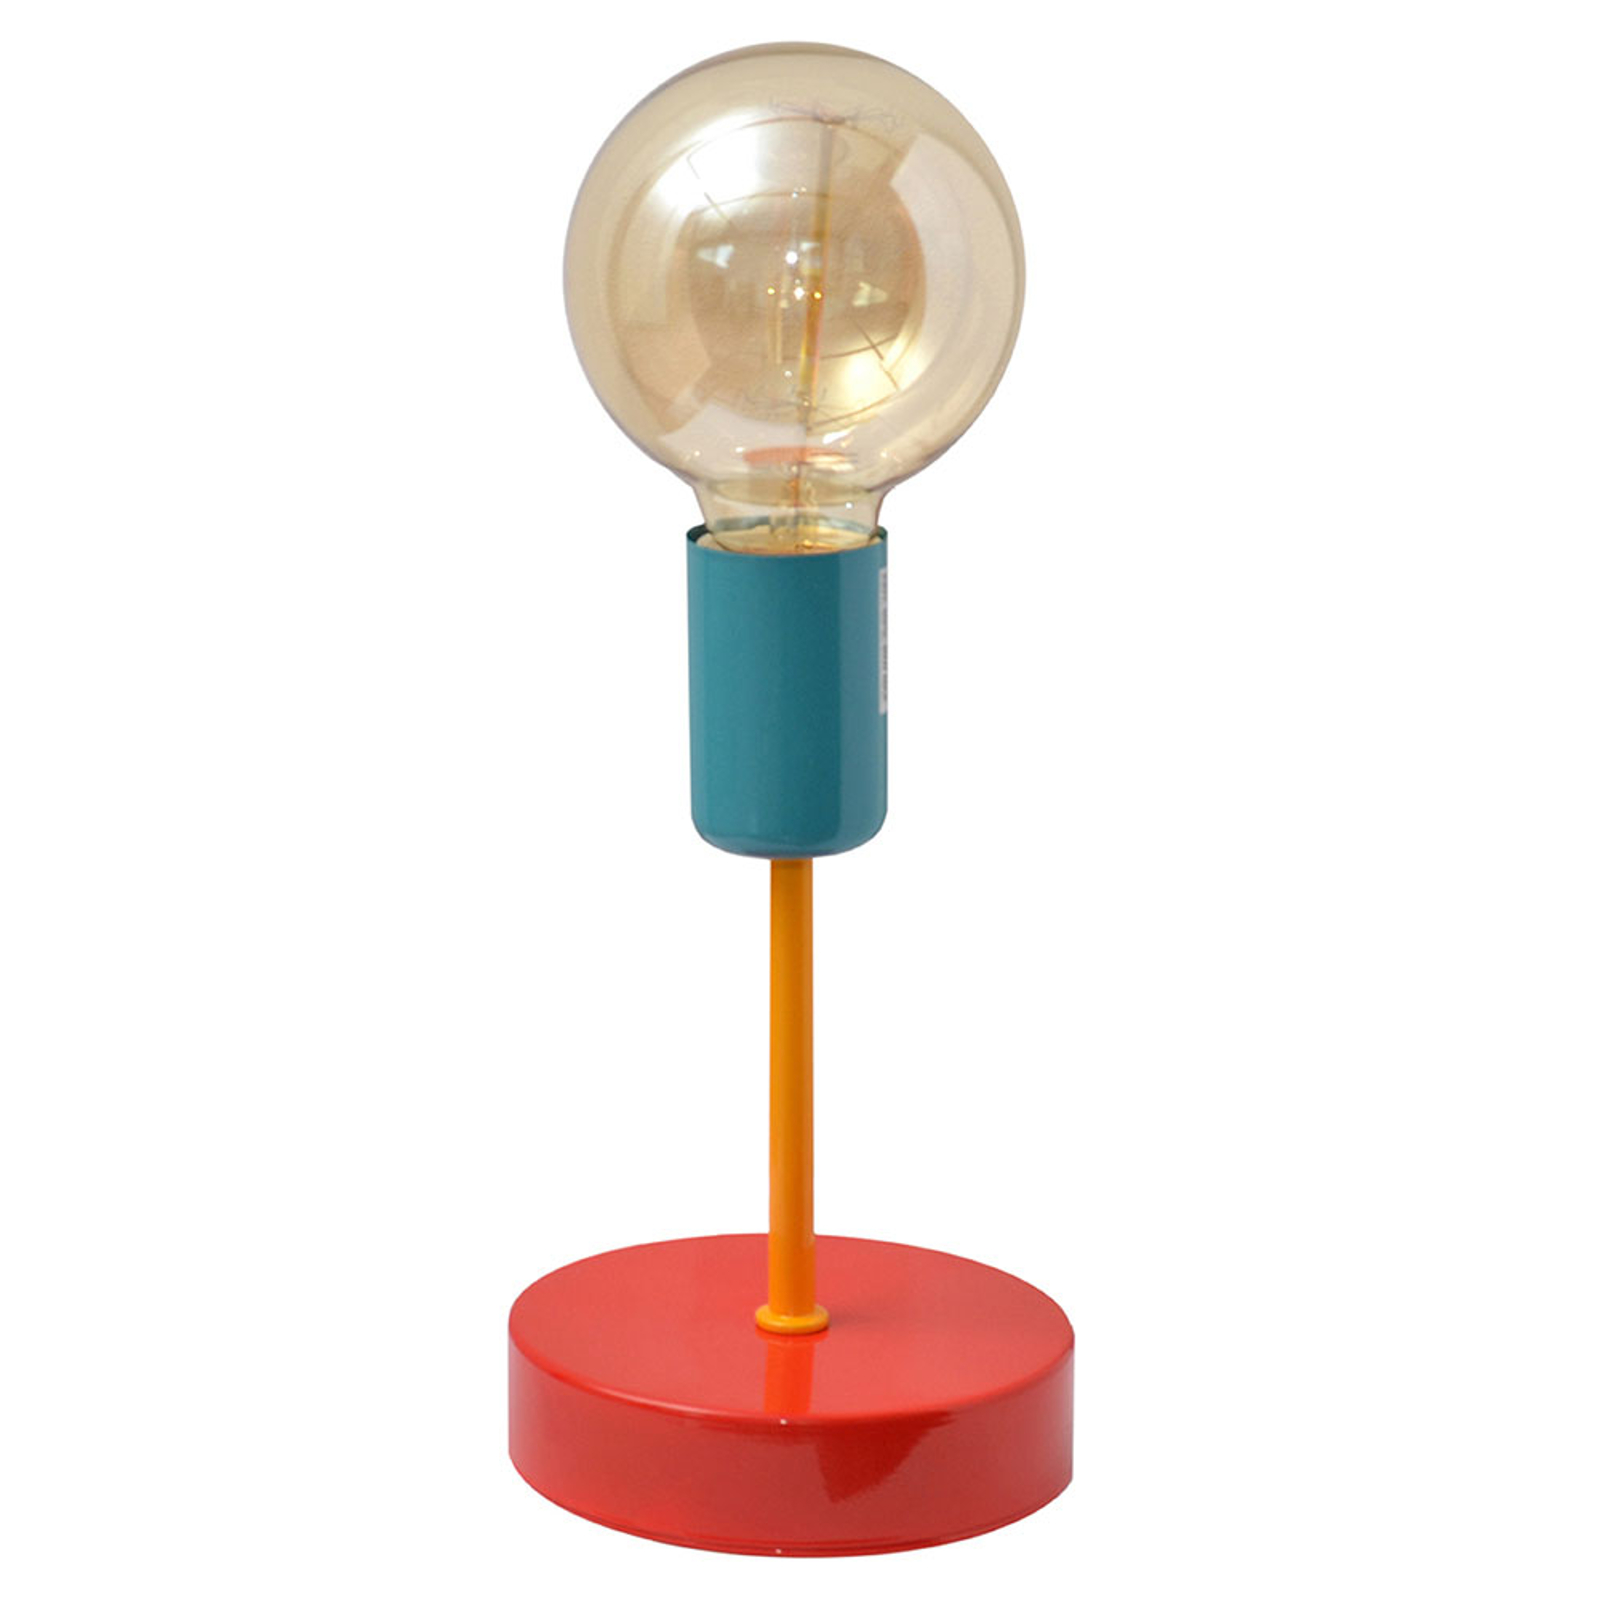 Lampe table colorée Oxford rouge/orange/turquoise